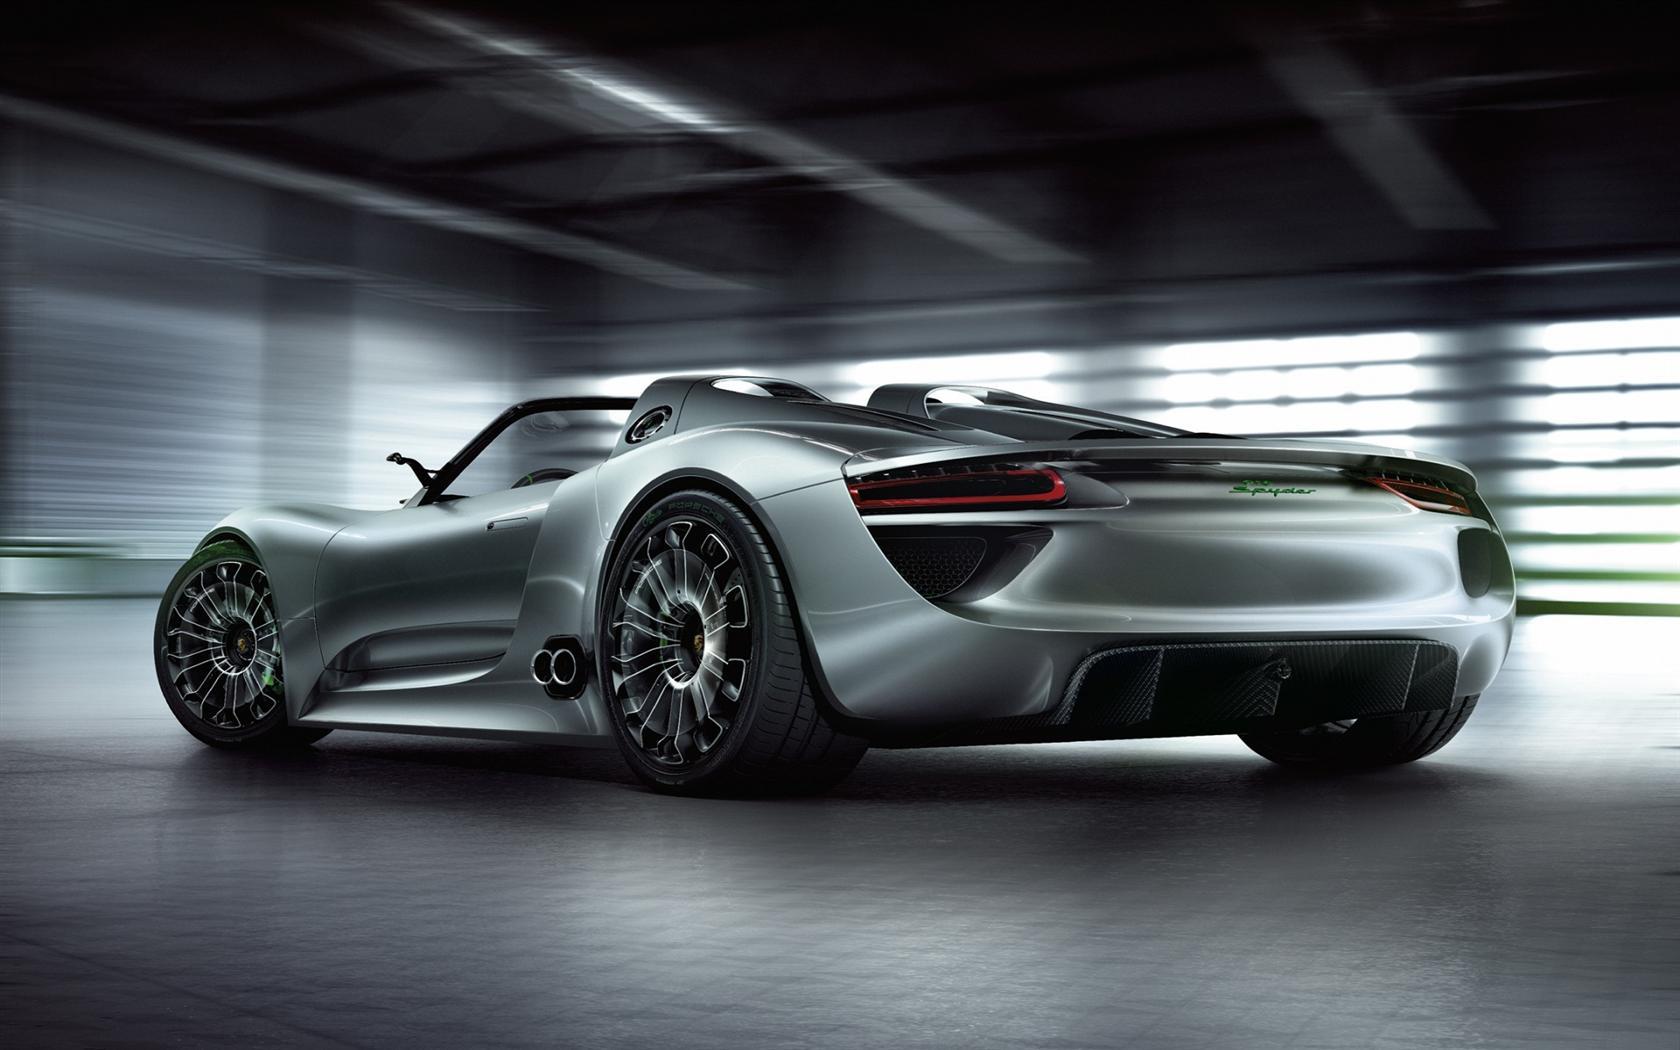 2010 Porsche 918 Spyder Concept Image Photo 13 Of 14